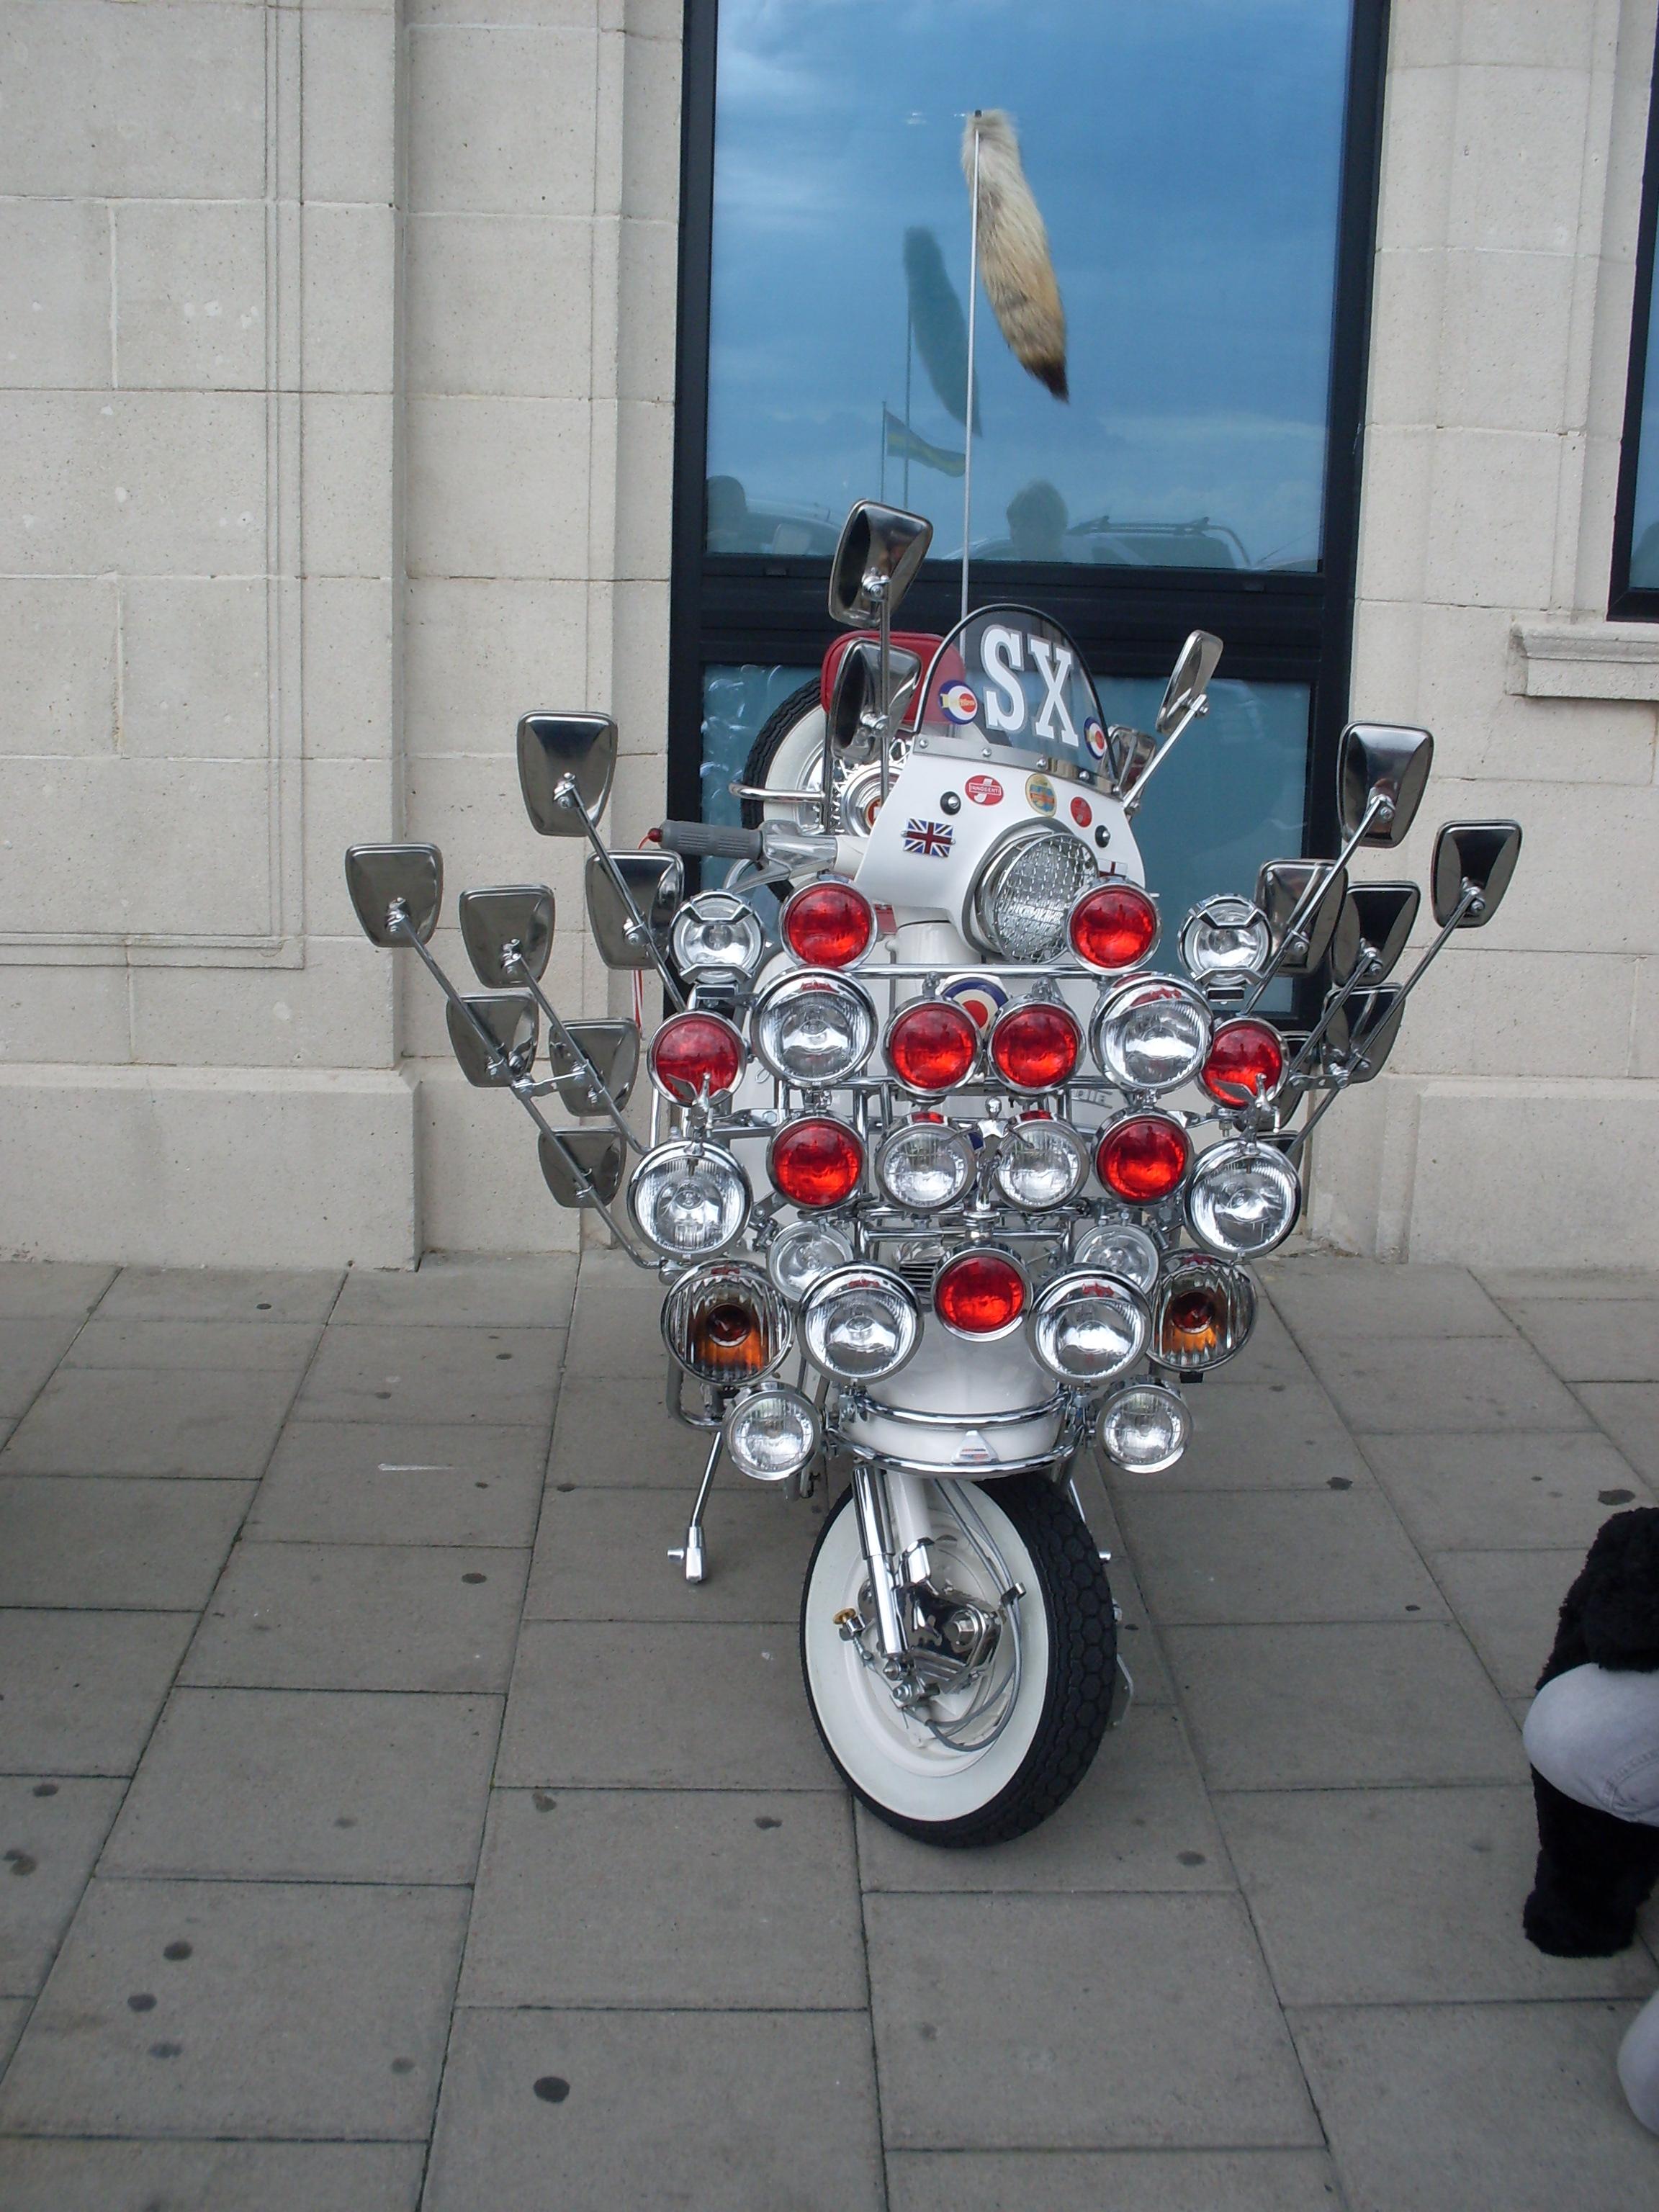 scooter pics 001 brighton